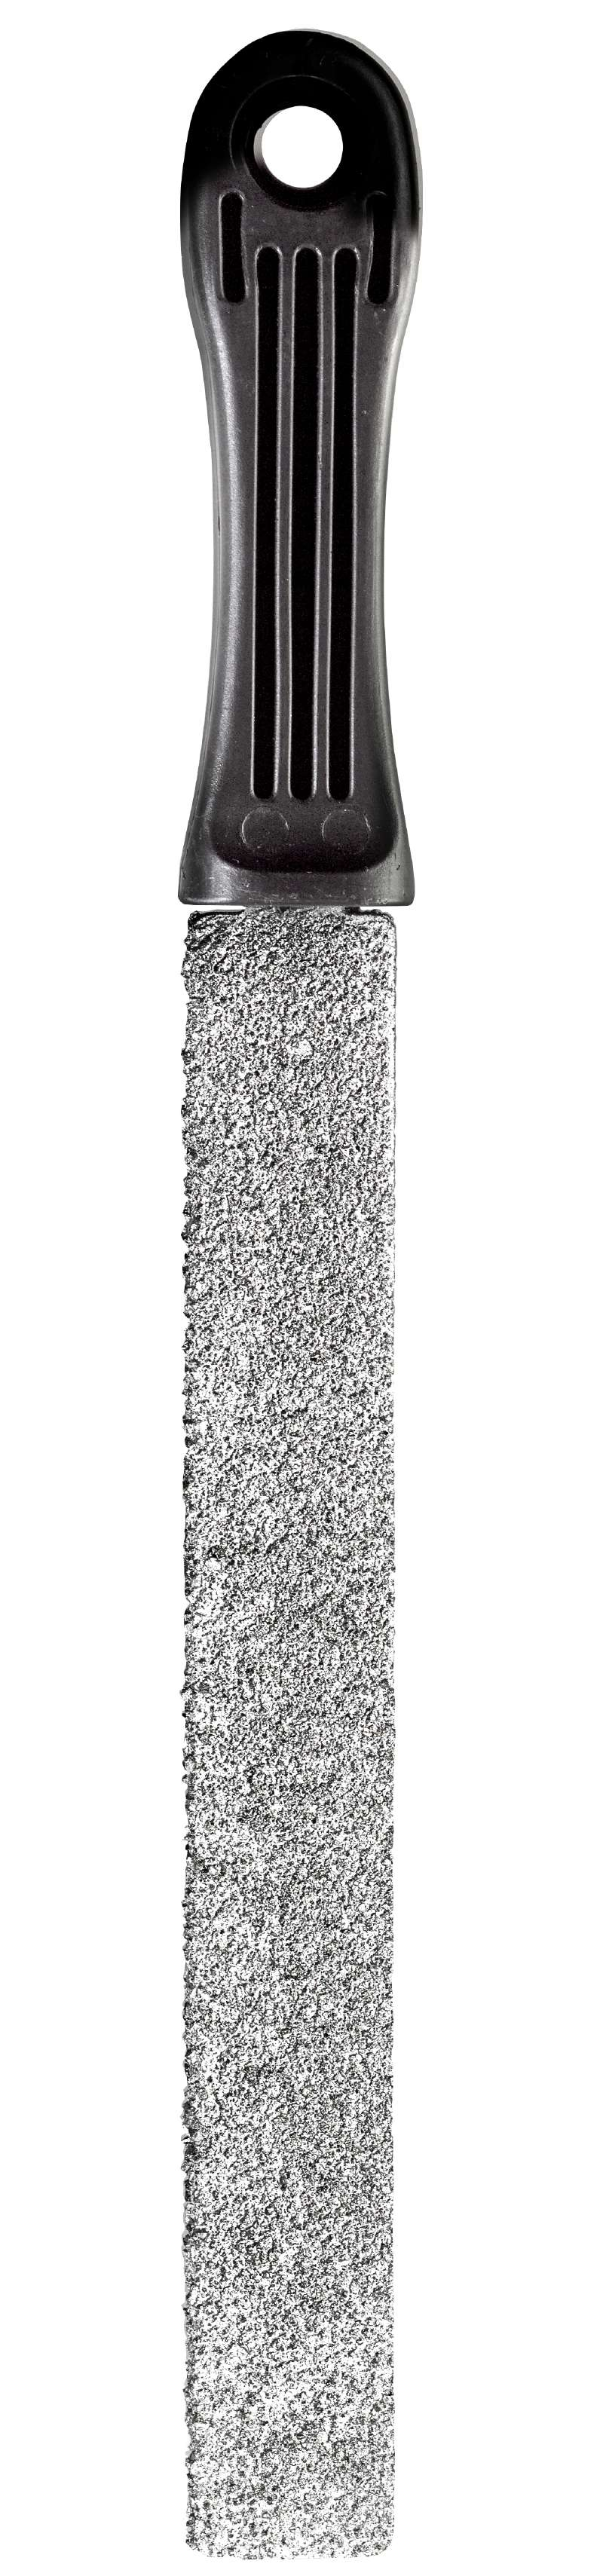 Напильник по металлу Kwb 4995-21 цены